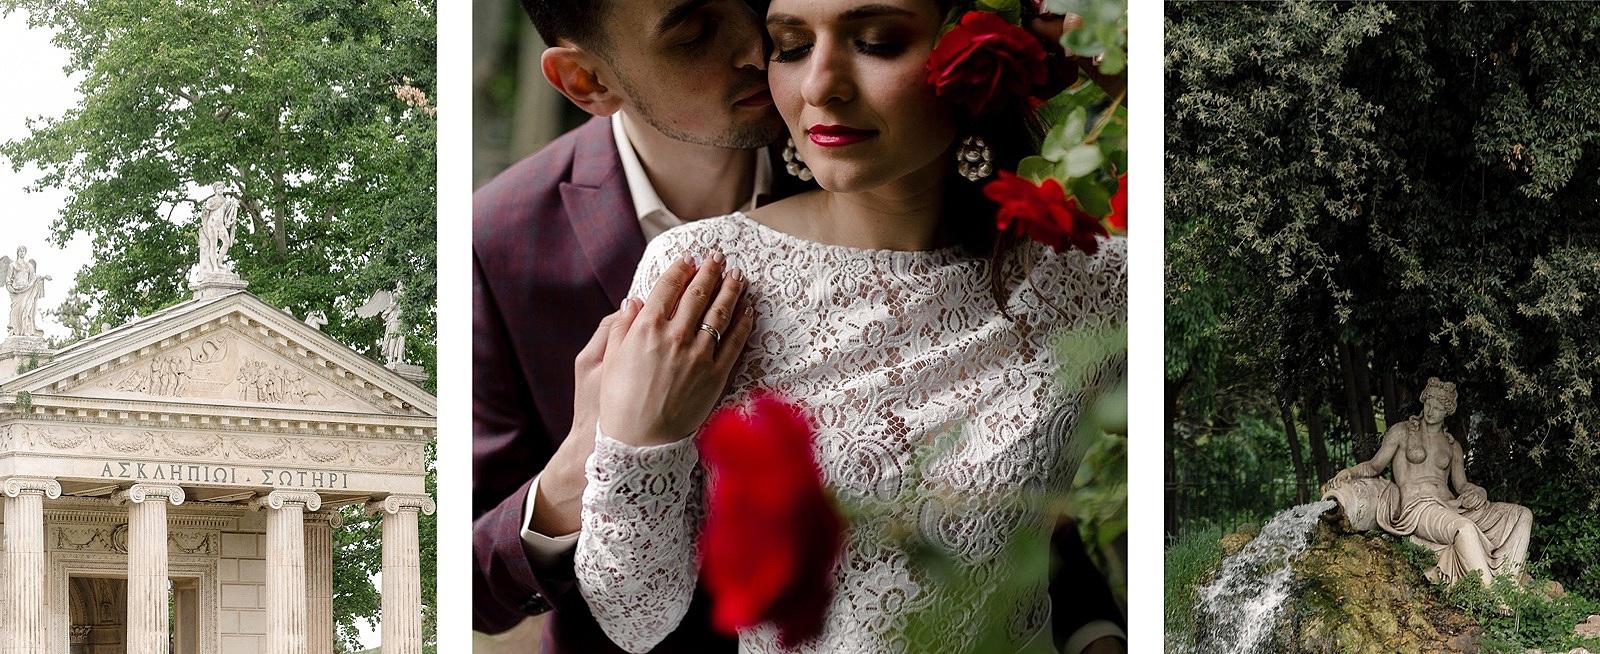 Fotomagoria Wedding Rome Photographer 8.jpg